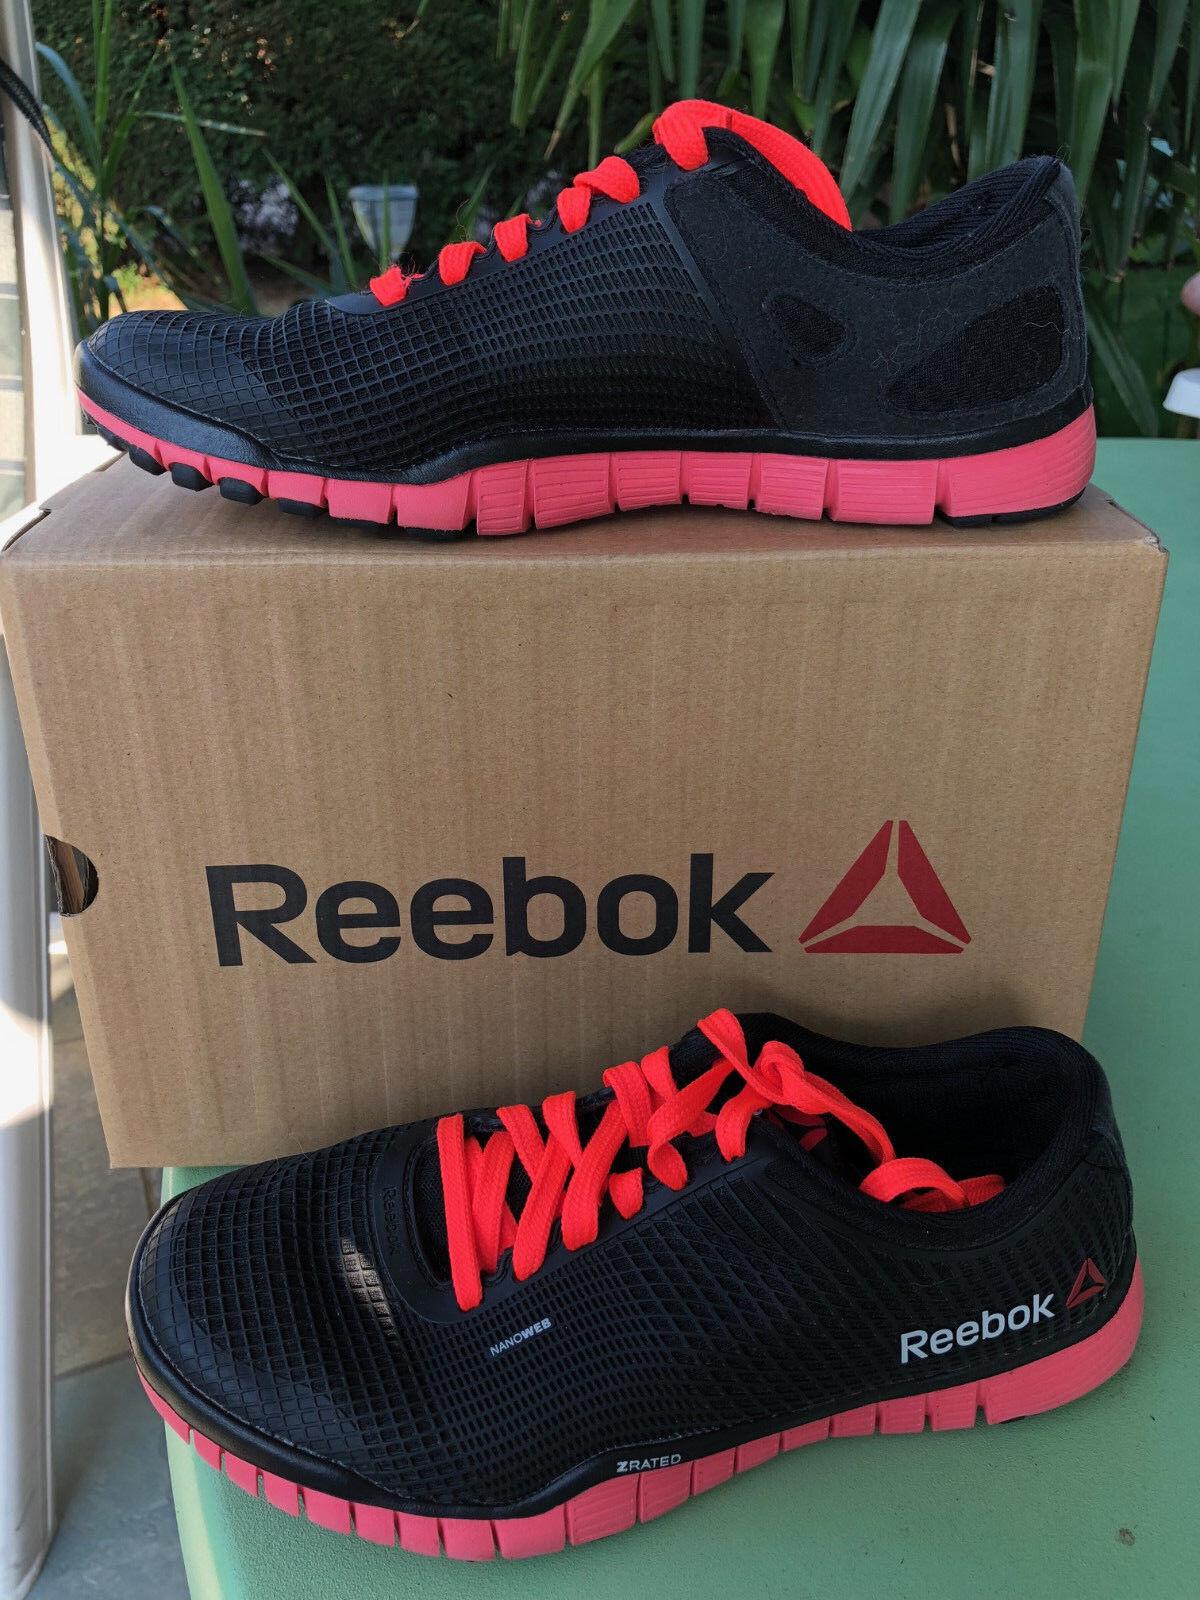 REEBOK RF ZRATED NANOWEB - Damen Training - Fitness - NANOWEB Pilates - Turnschuh-Sneaker b71494